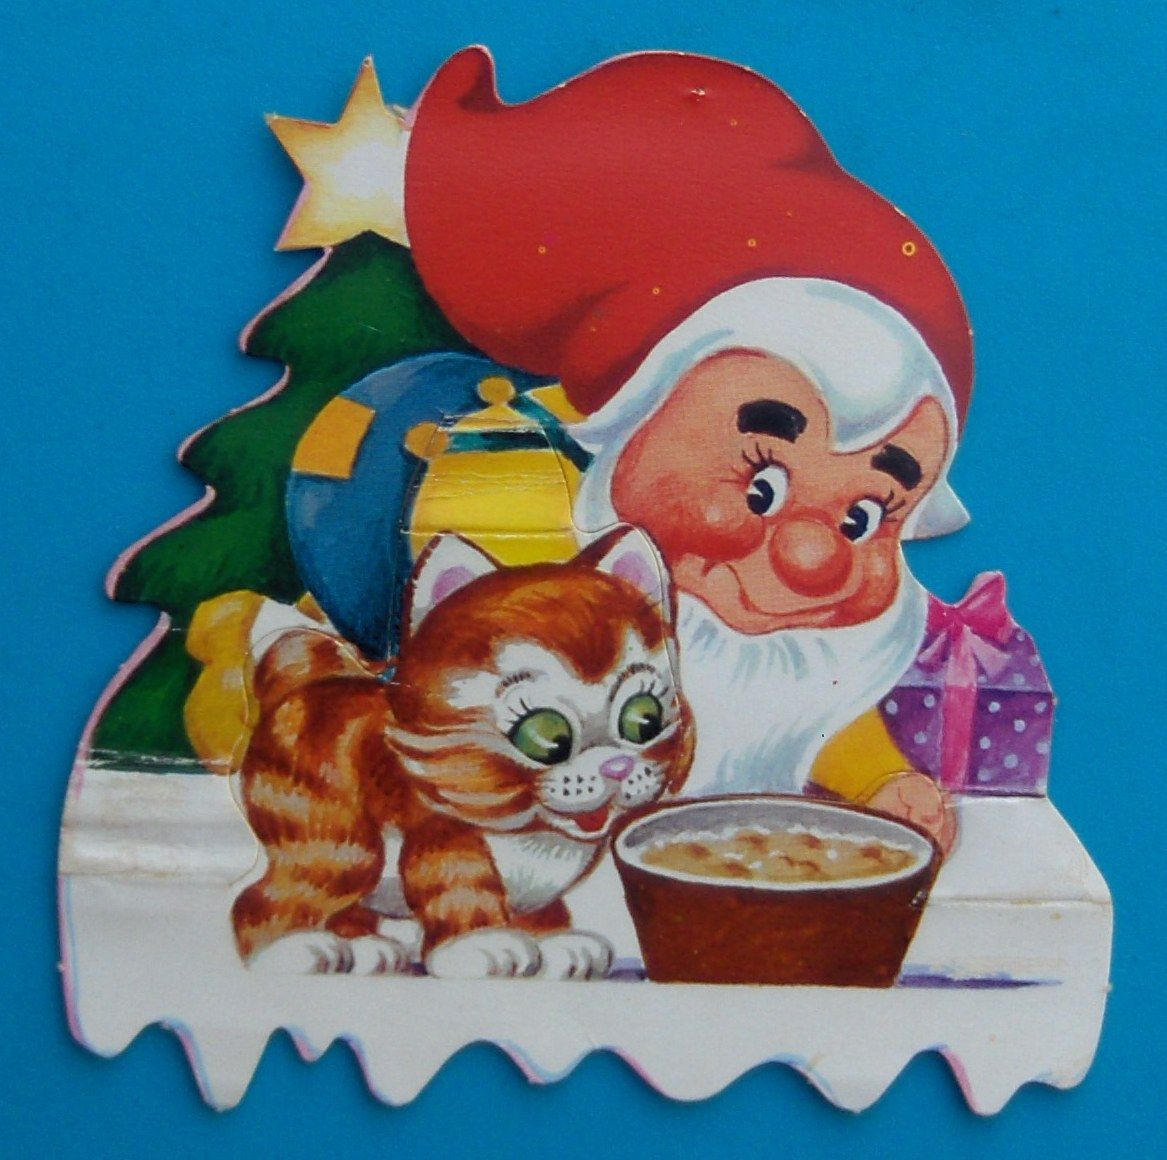 kravl-nisser-jul-side1